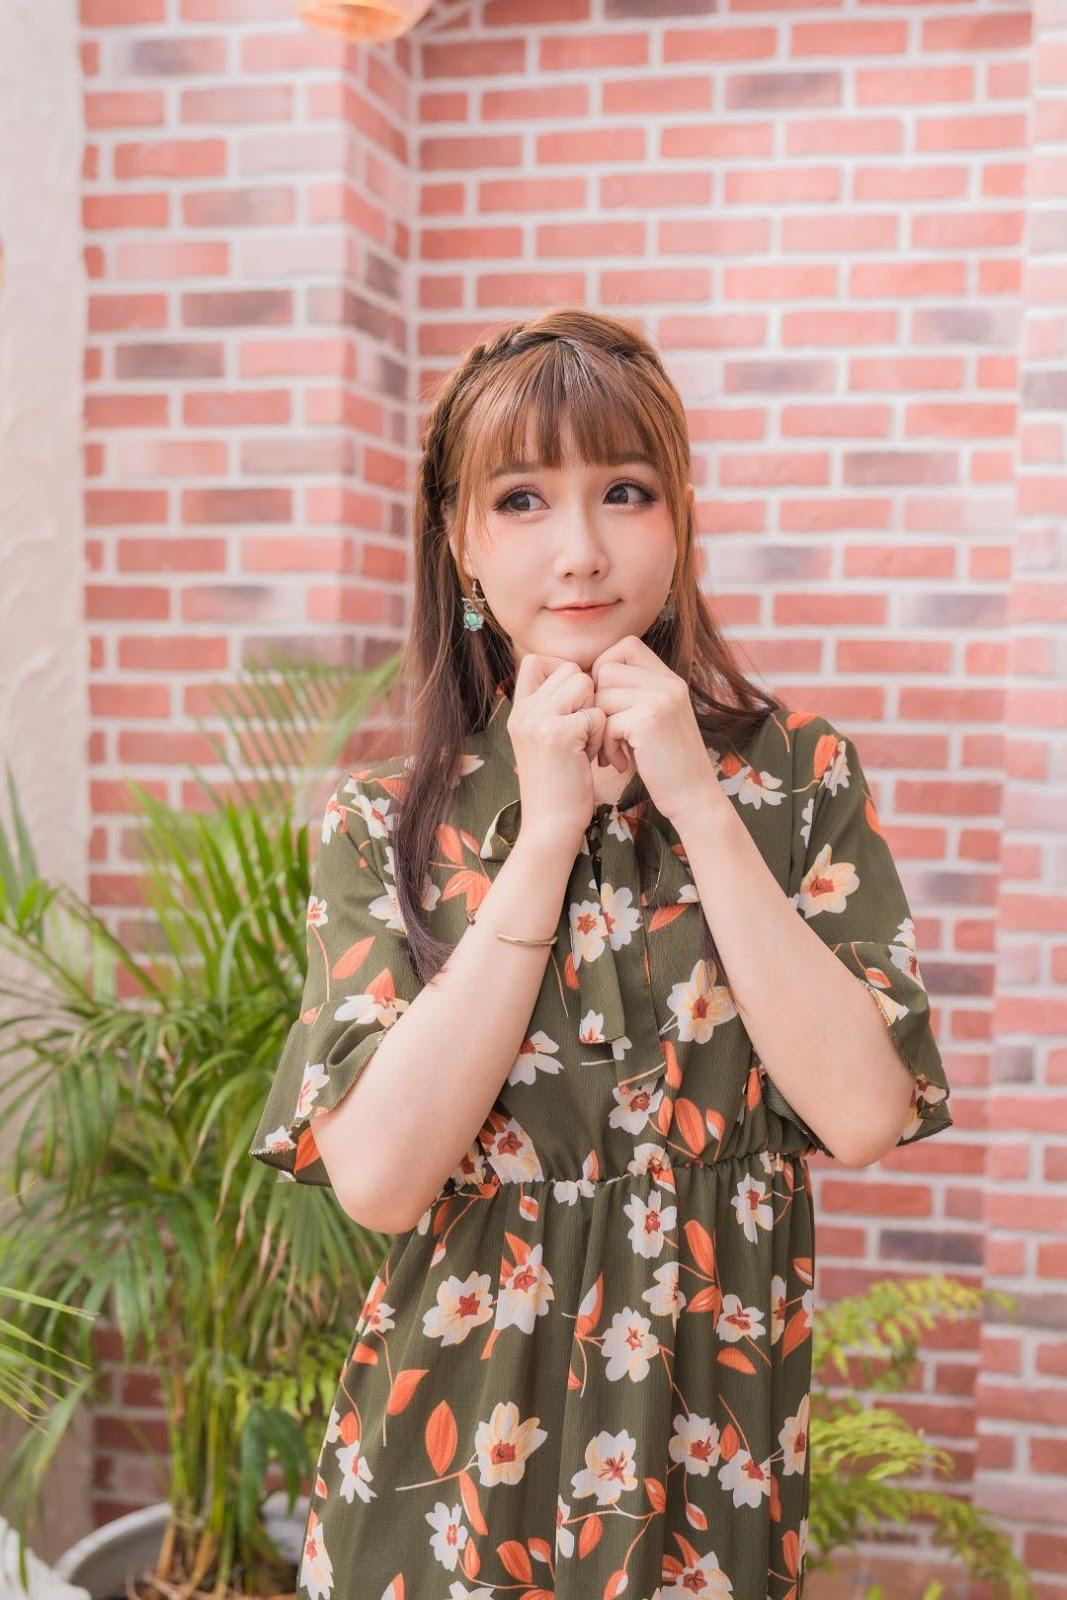 Qiao Qiao Er - 喬喬兒 - 2019.08.11 - Coffe Time Waiting For Someone - TruePic.net